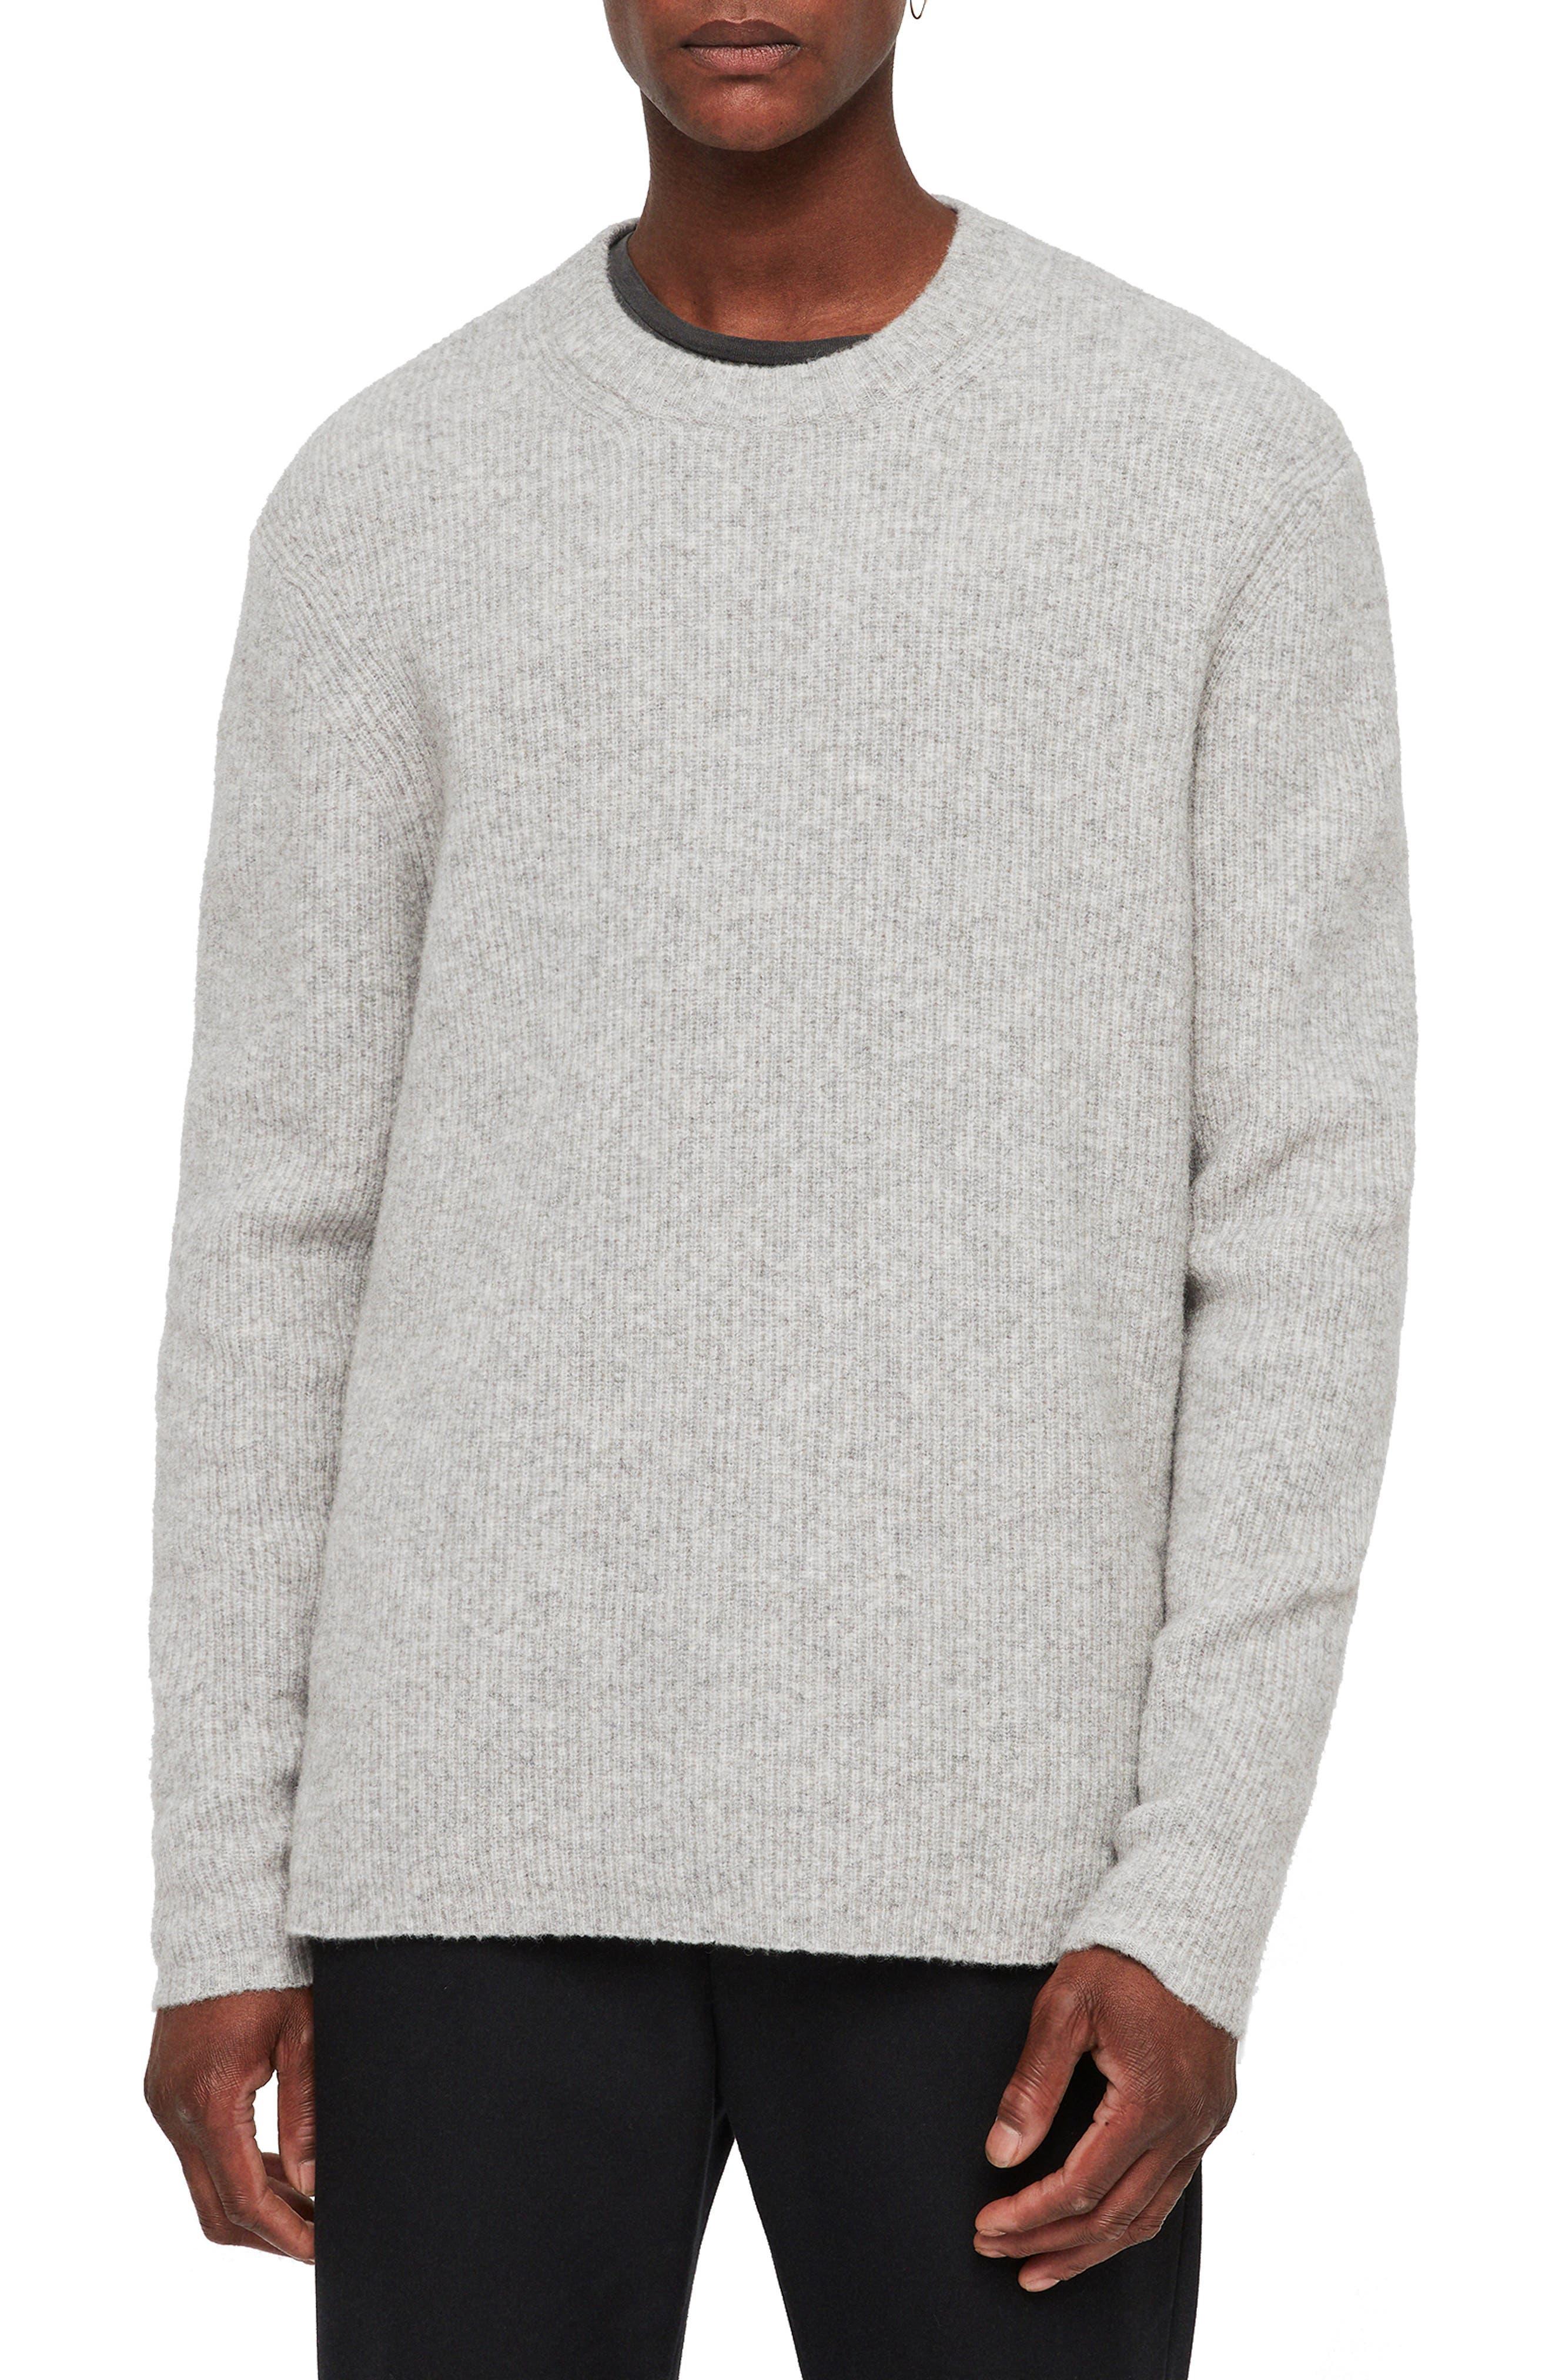 Path Wool Blend Sweater,                         Main,                         color, LIGHT GREY MARL